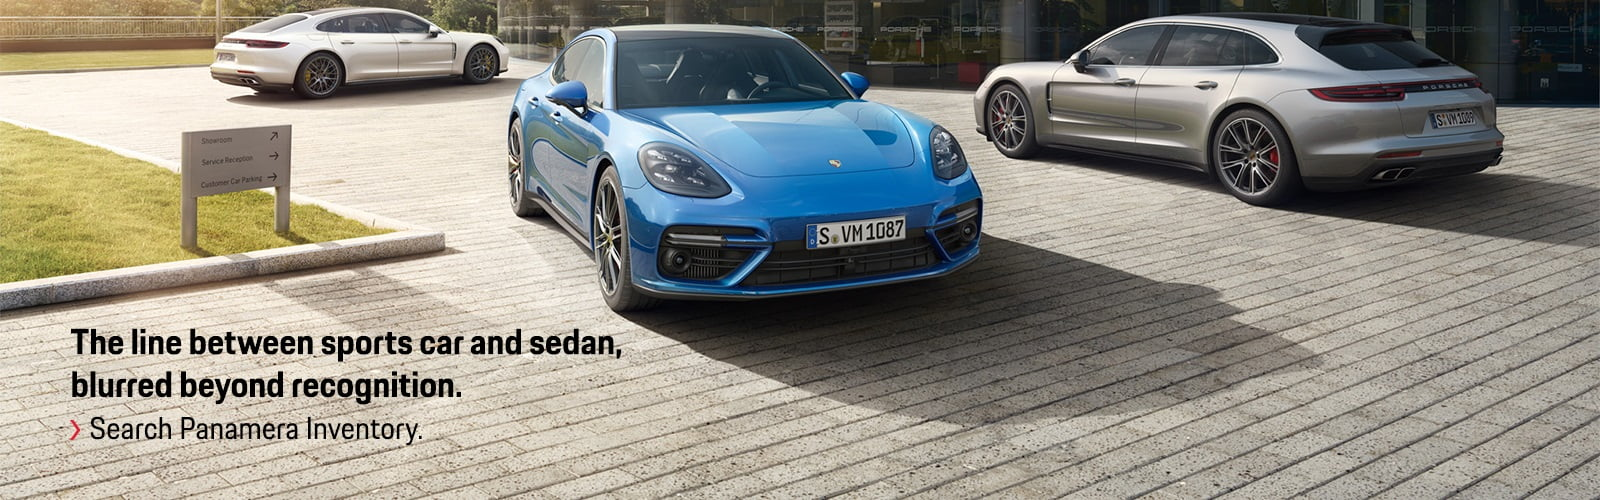 The New Porsche Panamera Used